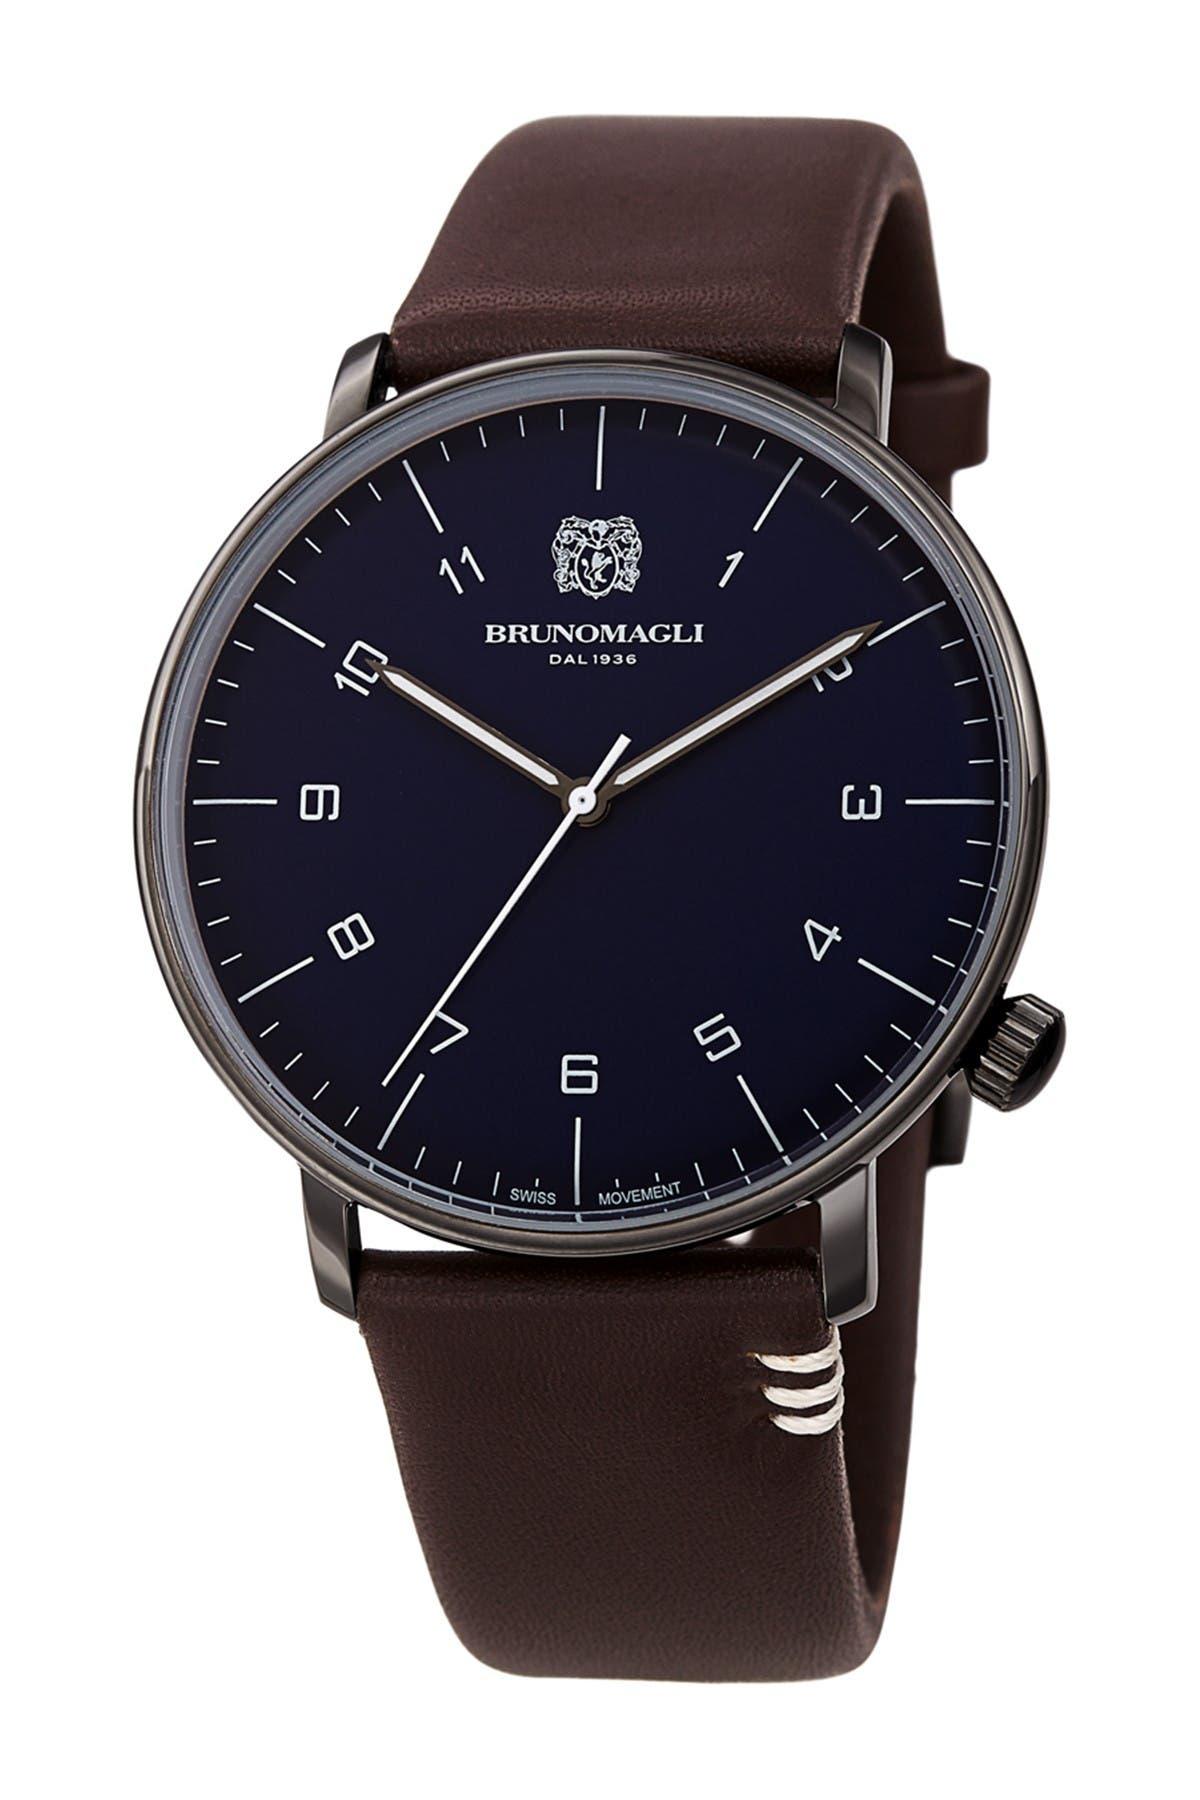 Image of Bruno Magli Men's Roma Moderna Leather Strap Watch, 43mm